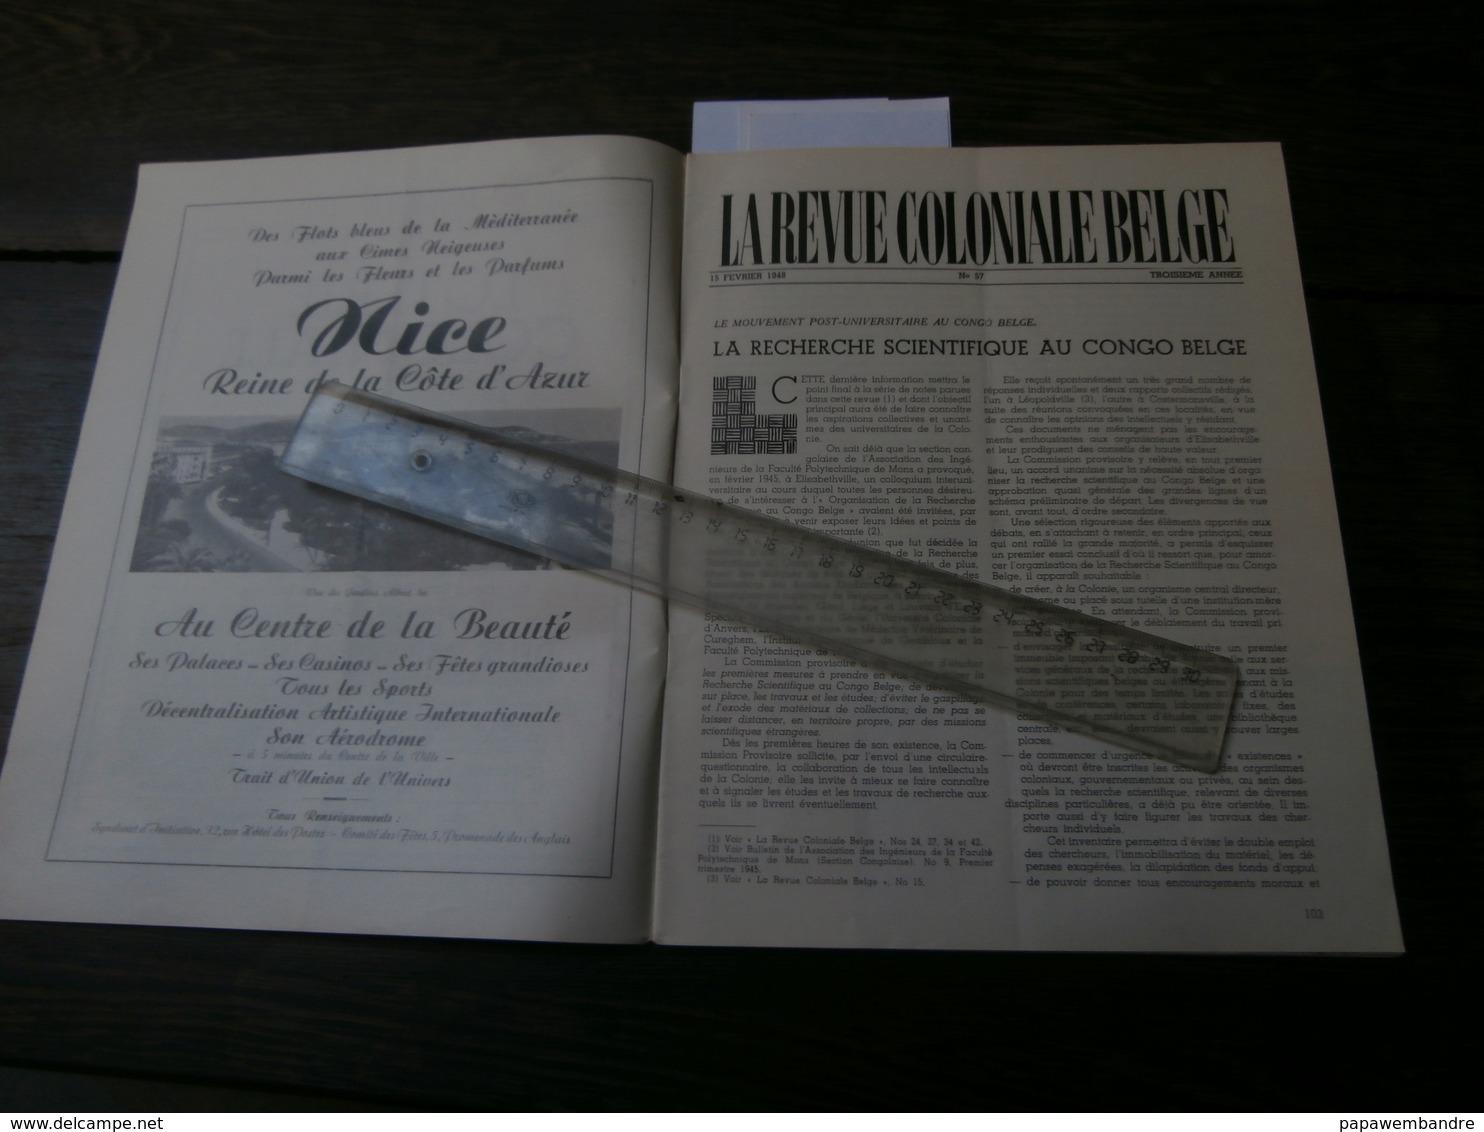 La Revue Coloniale Belge 57 (15/02/1948) : Congo, Sanga, Loterie Col., G Pacha, - Livres, BD, Revues